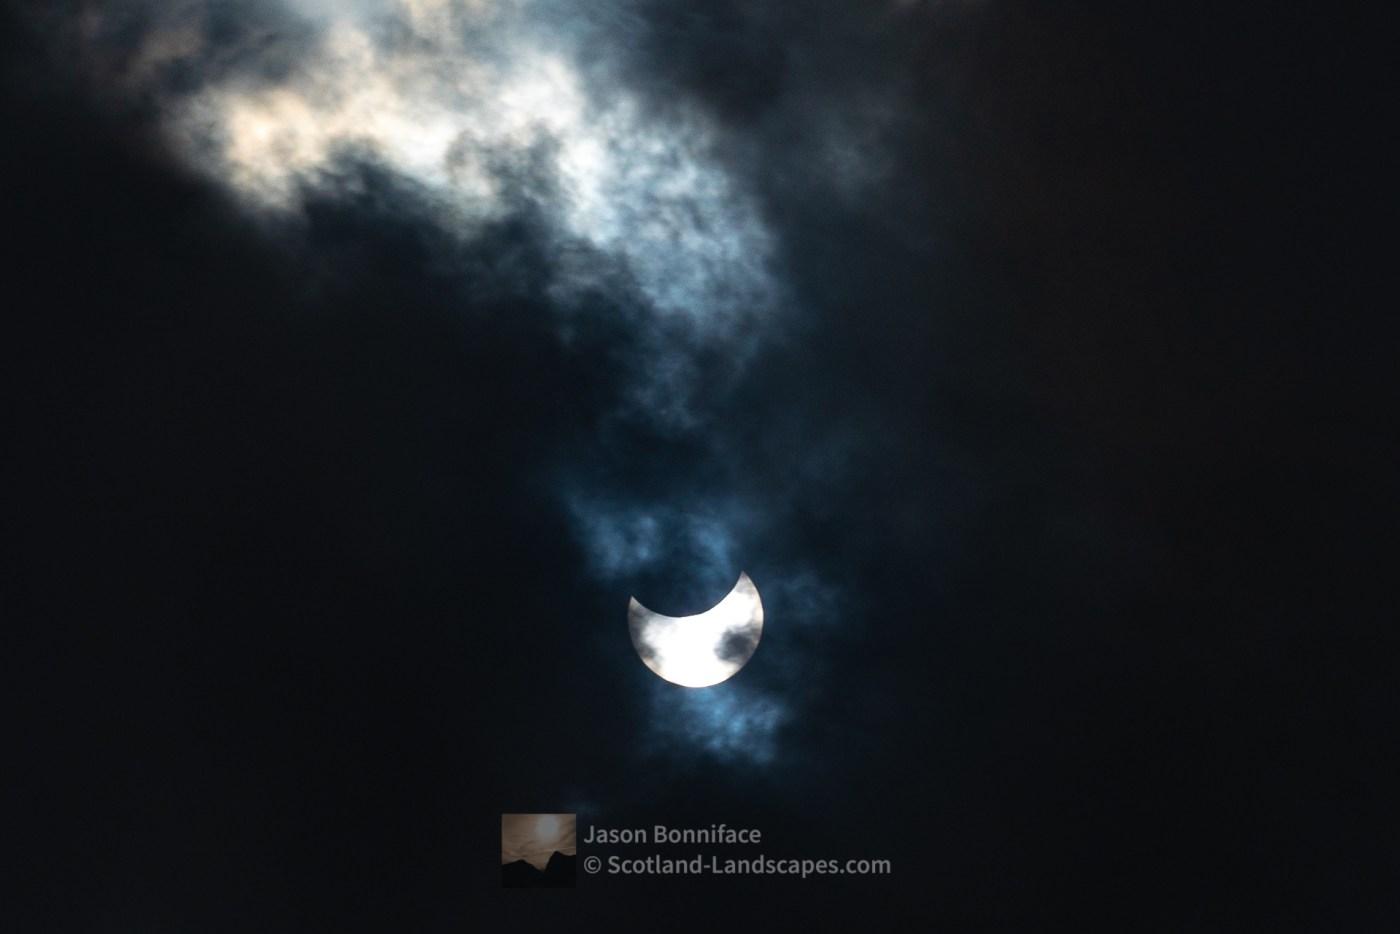 Partial Eclipse 10th June 2021 - A Glimpse Through The Clouds -1, Caithness